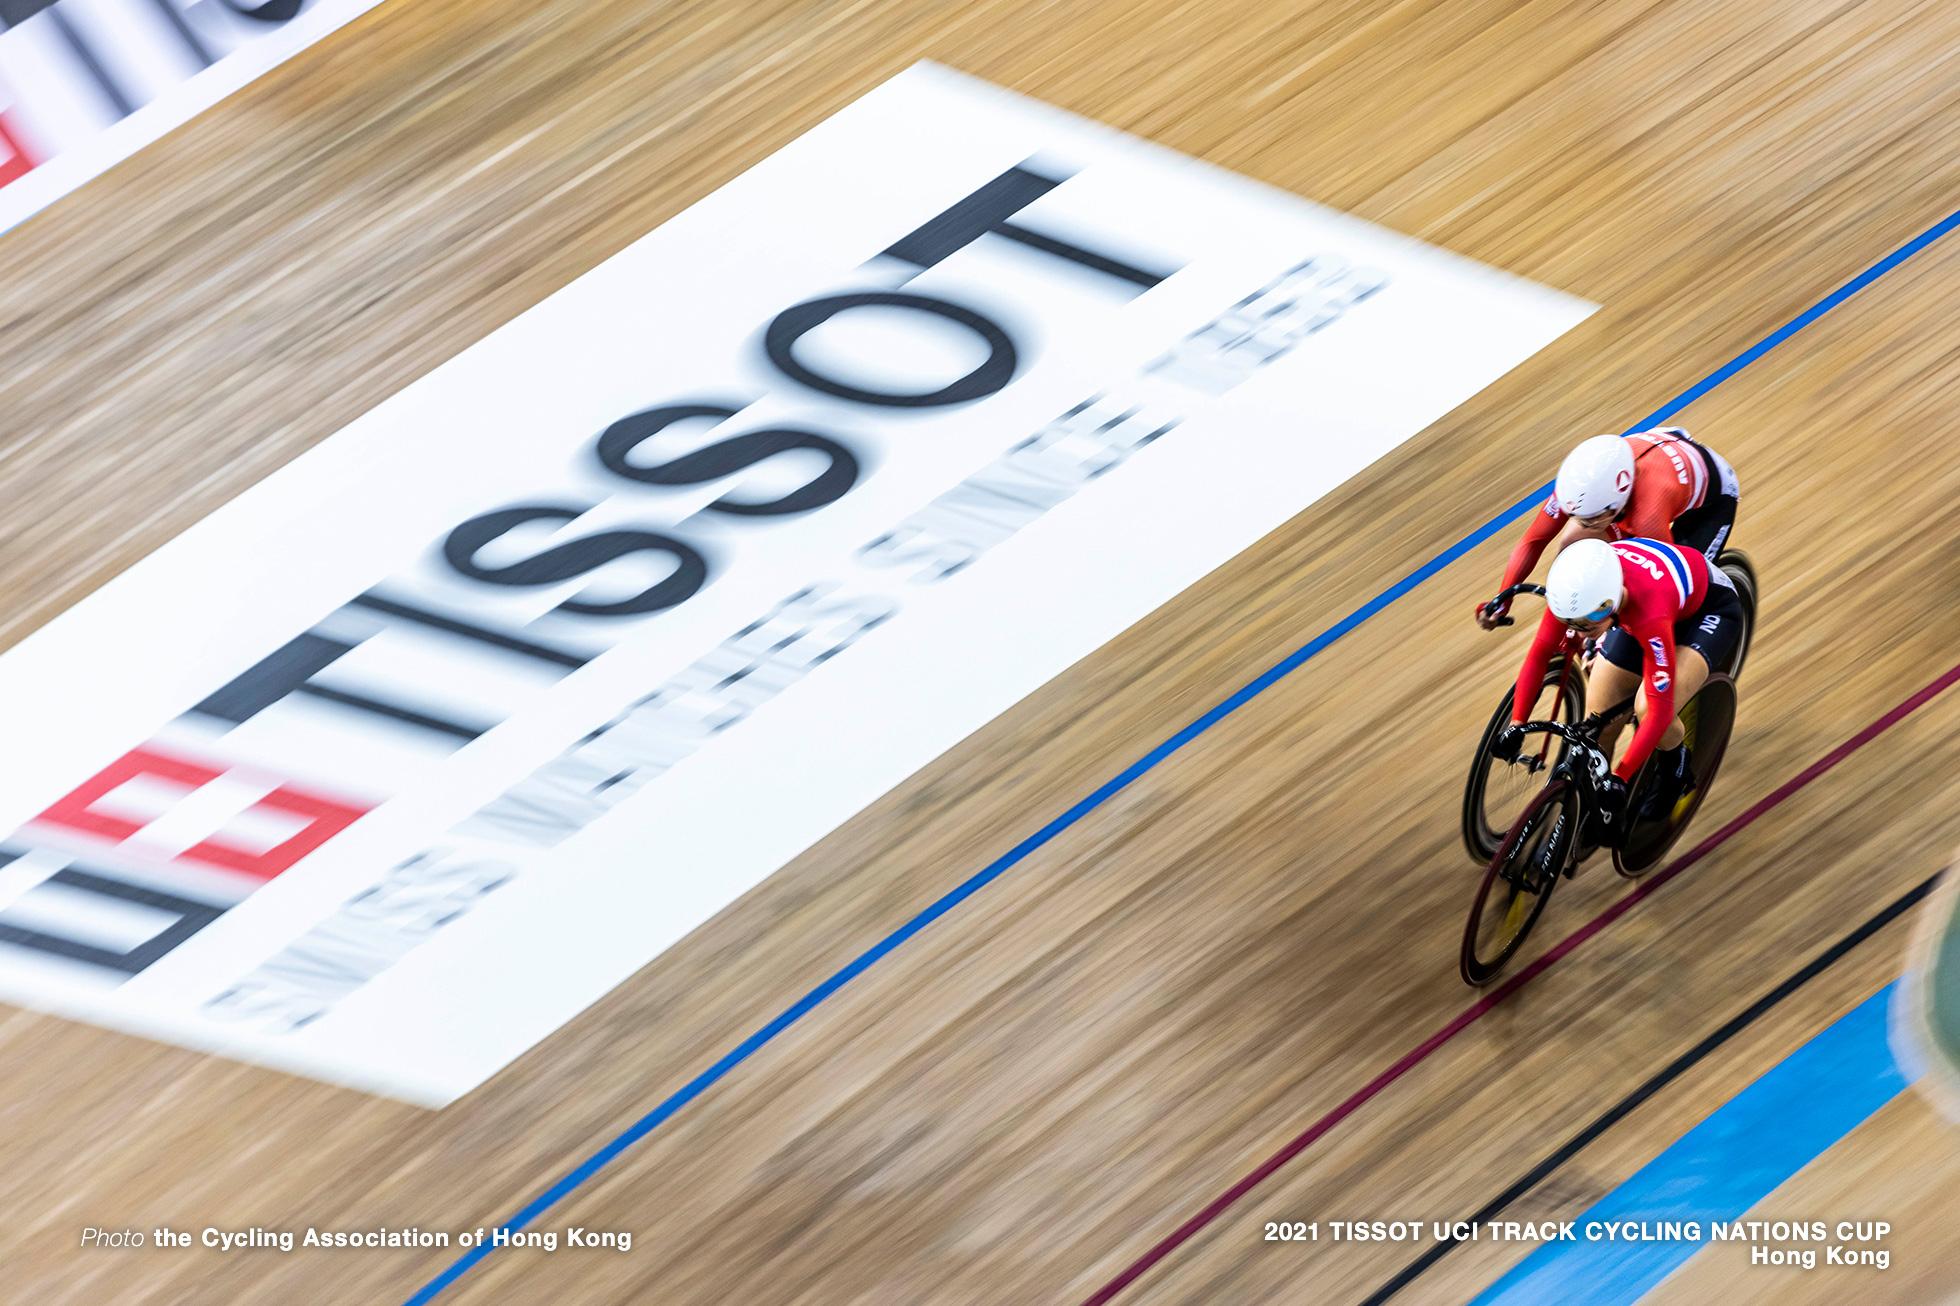 Women's Omnium, TISSOT UCI TRACK CYCLING NATIONS CUP - HONG KONG